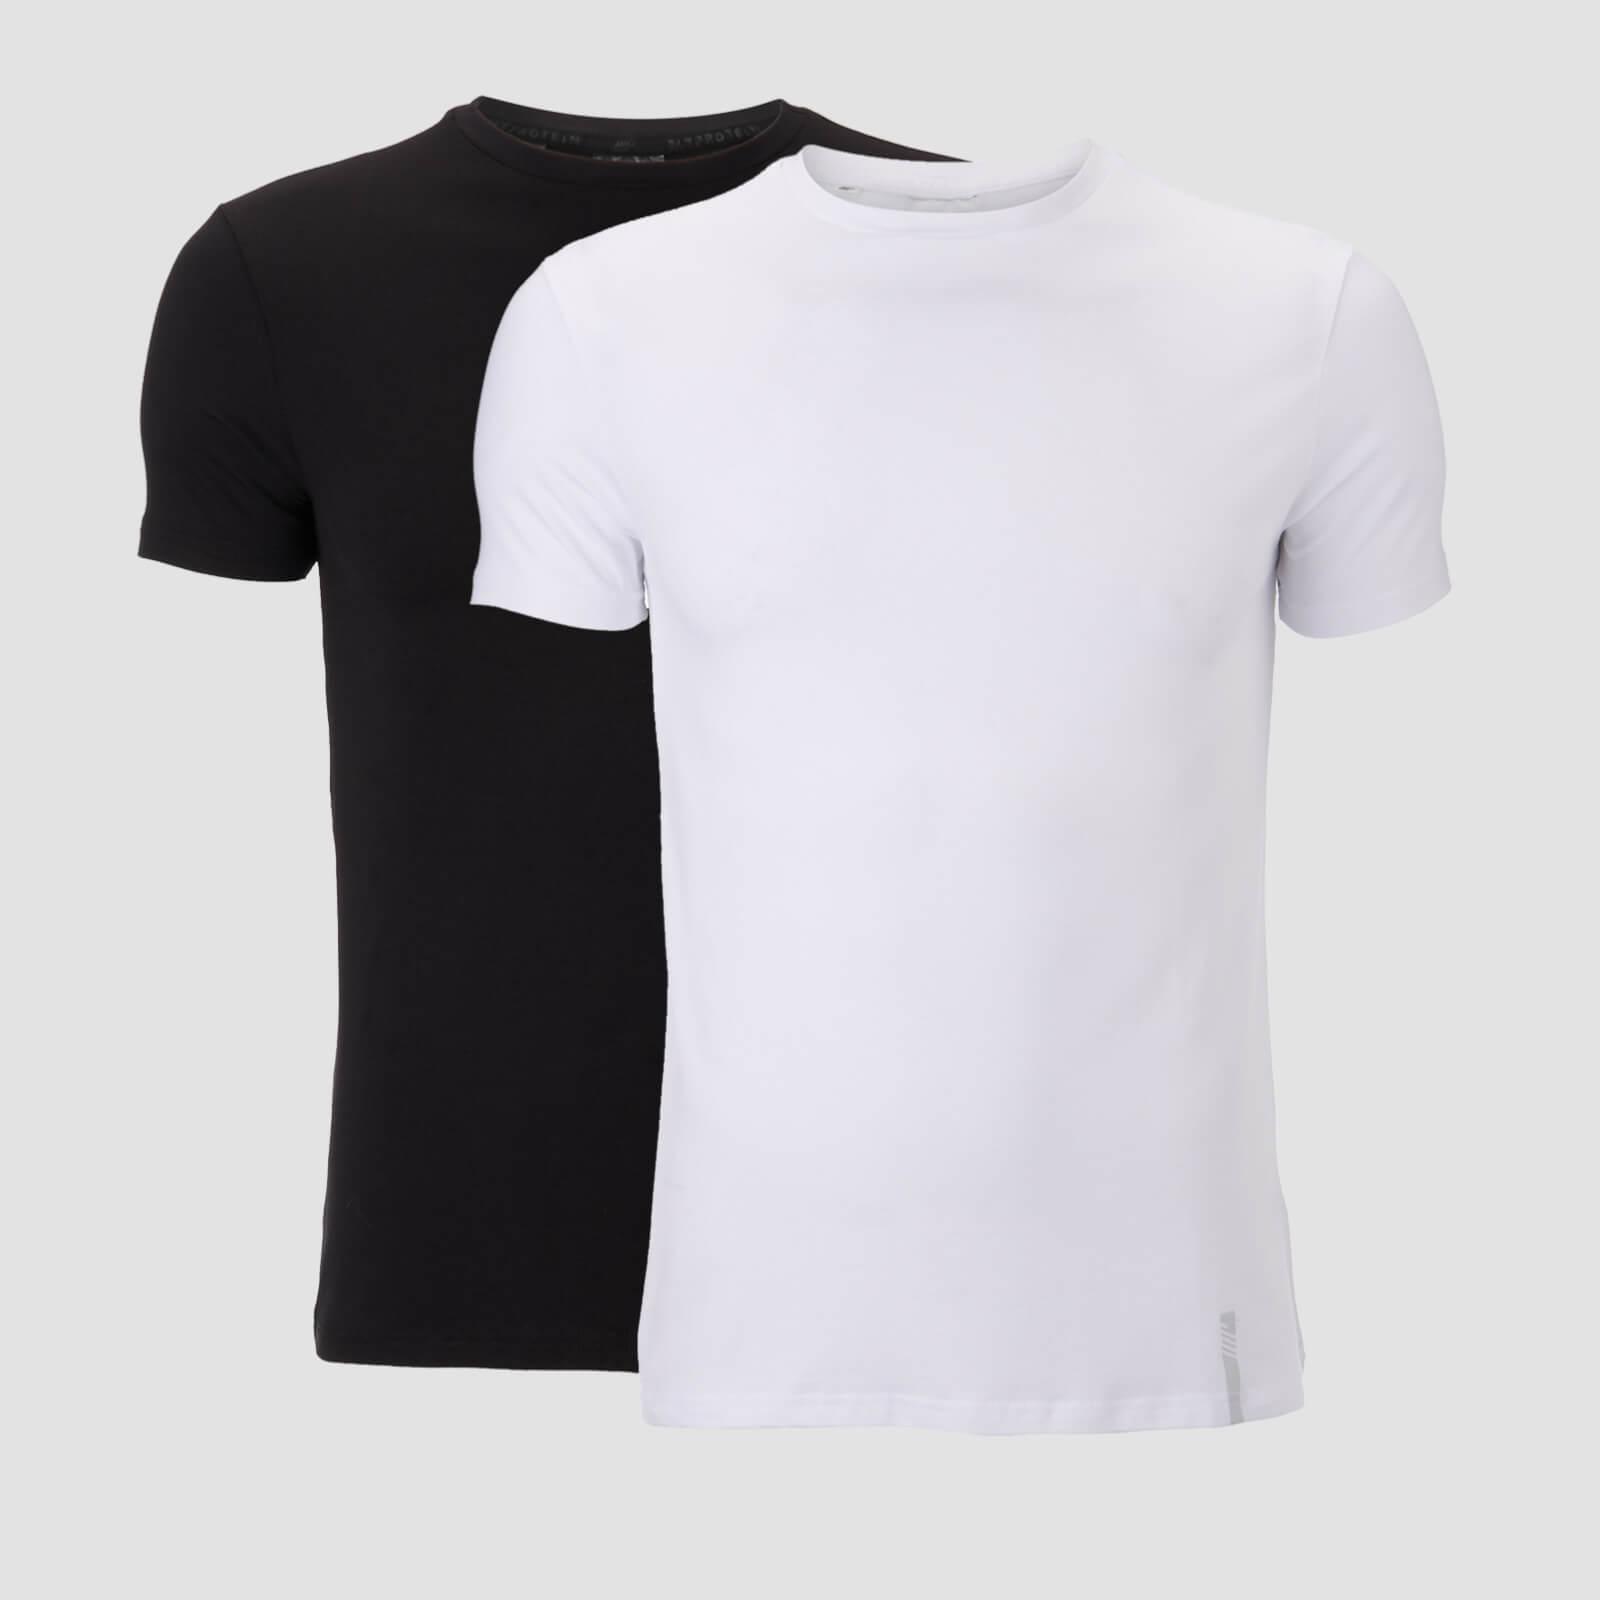 MP Luxe Classic Crew T-Shirt (2 Pack) - Sort/hvid - Xxl